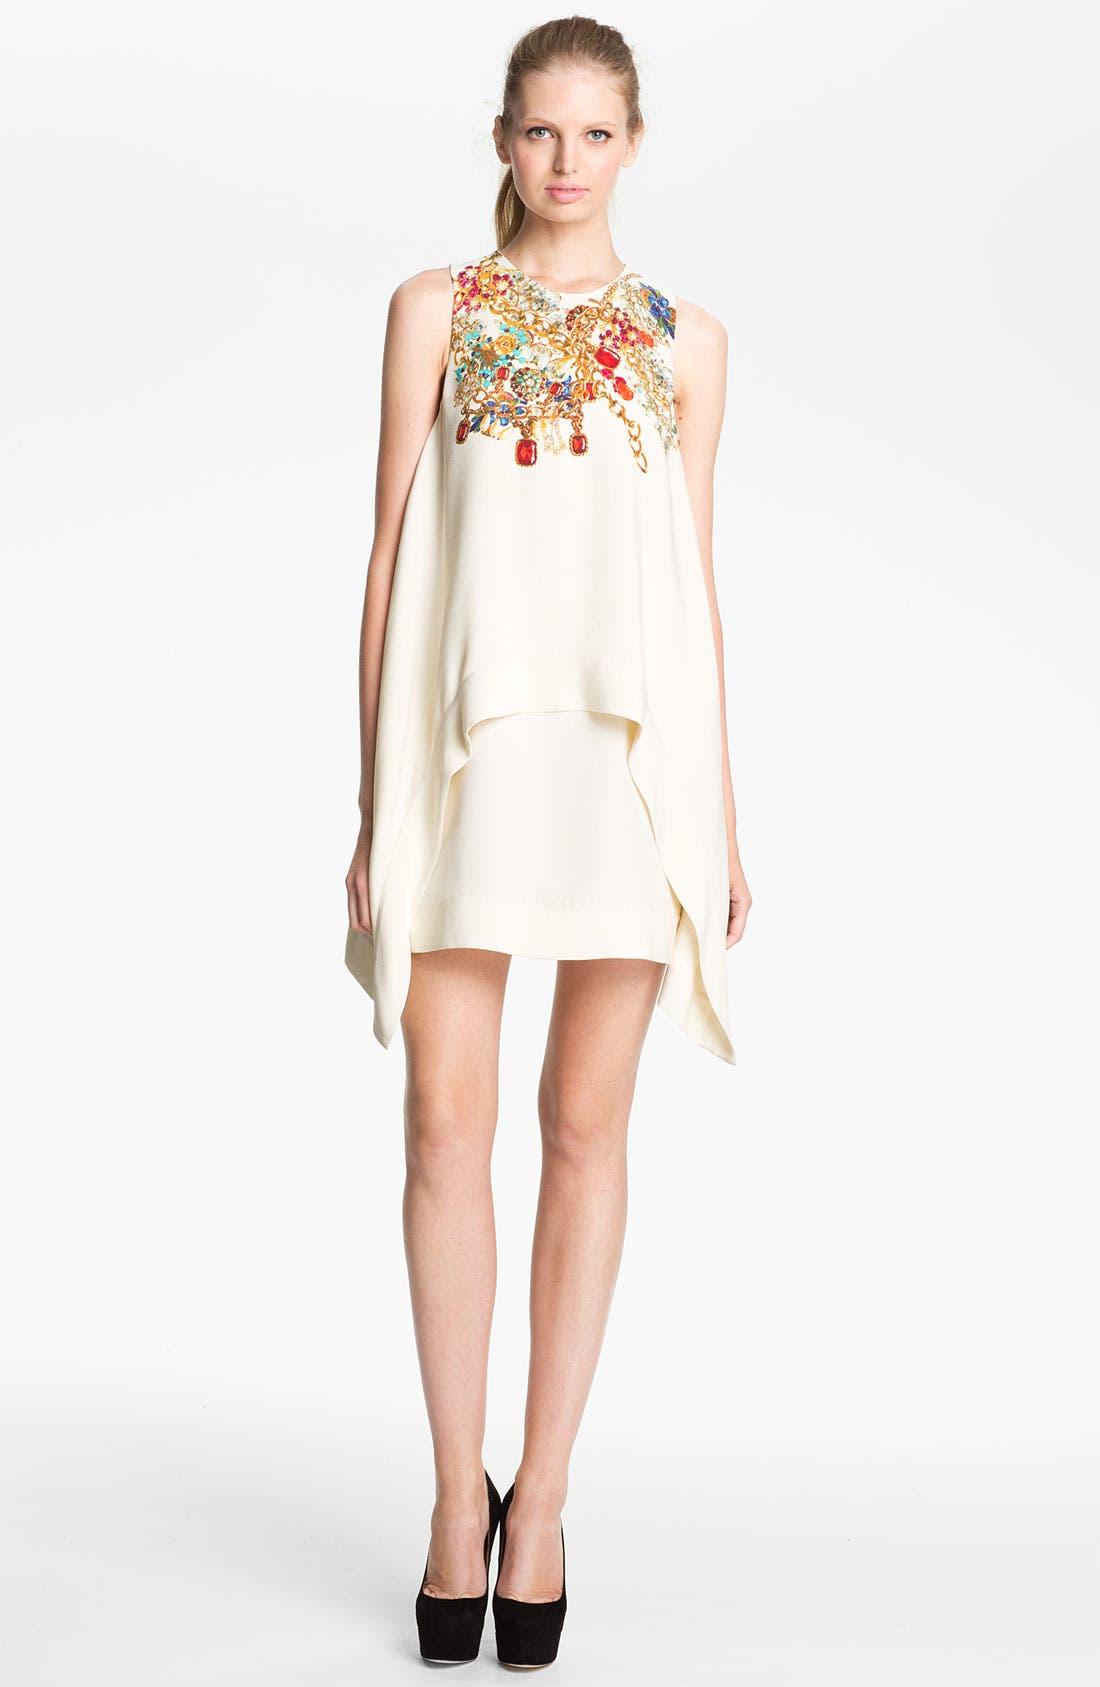 Main Image - camilla and marc 'Adorned' Jewel Print Draped Dress